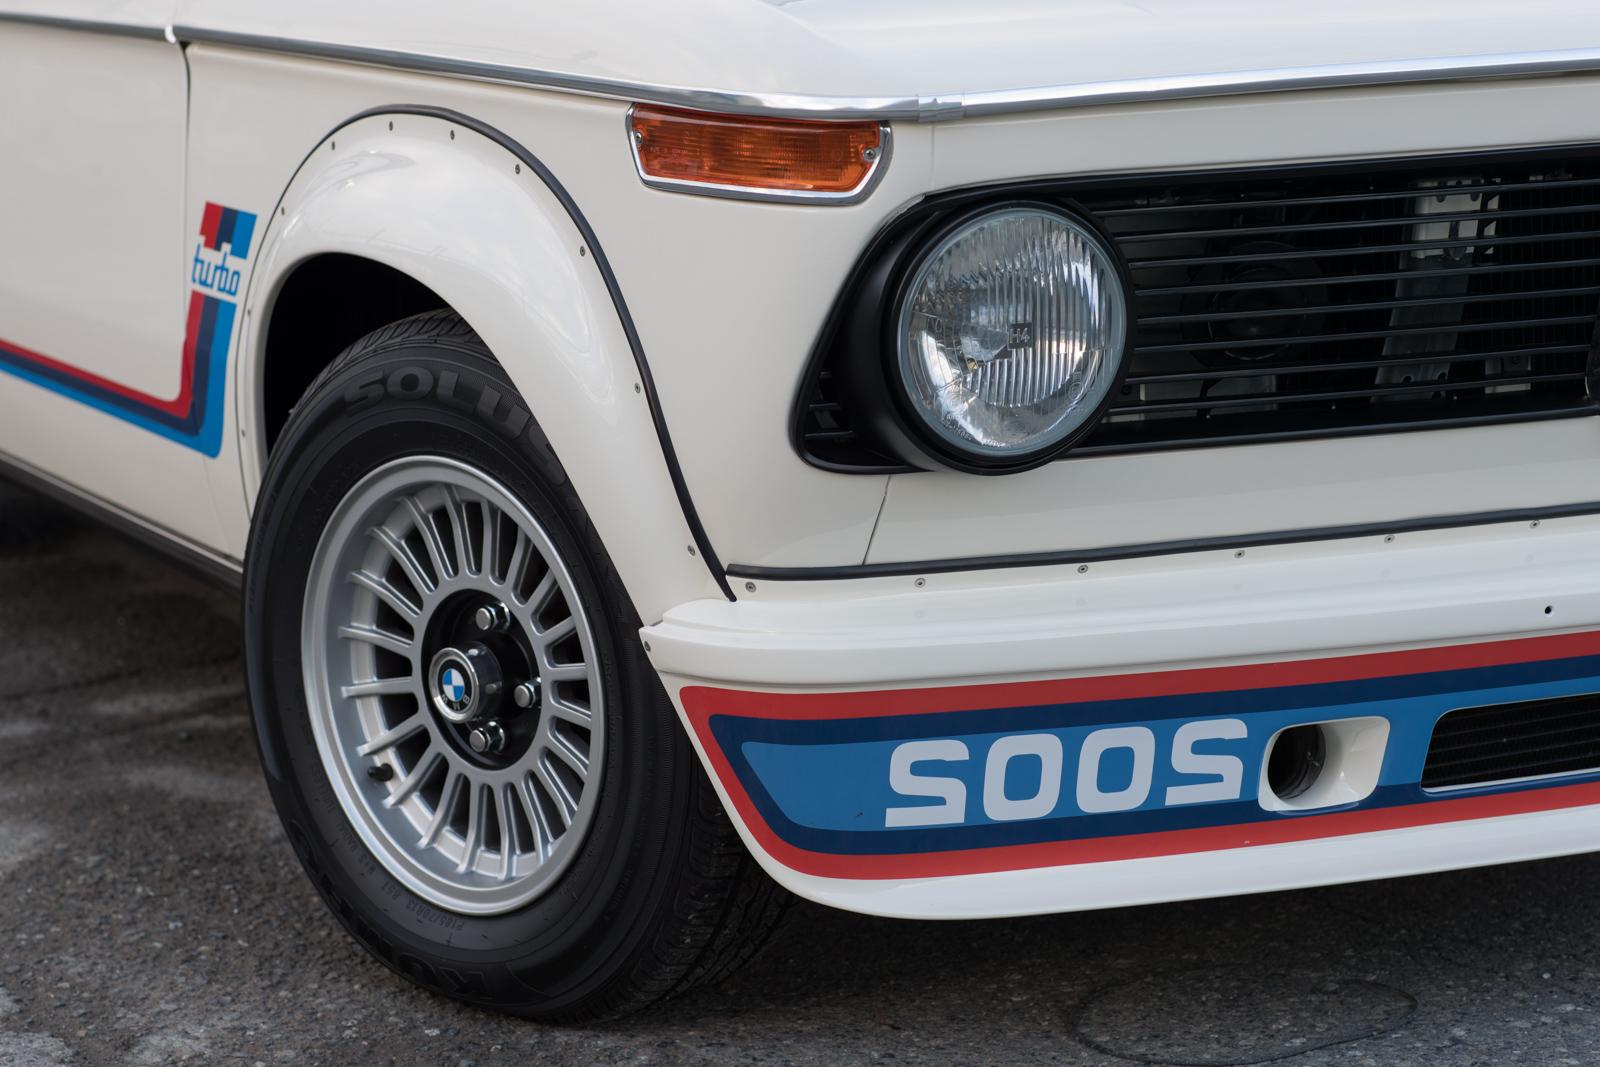 1974 BMW 2002 Turbo RH front corner